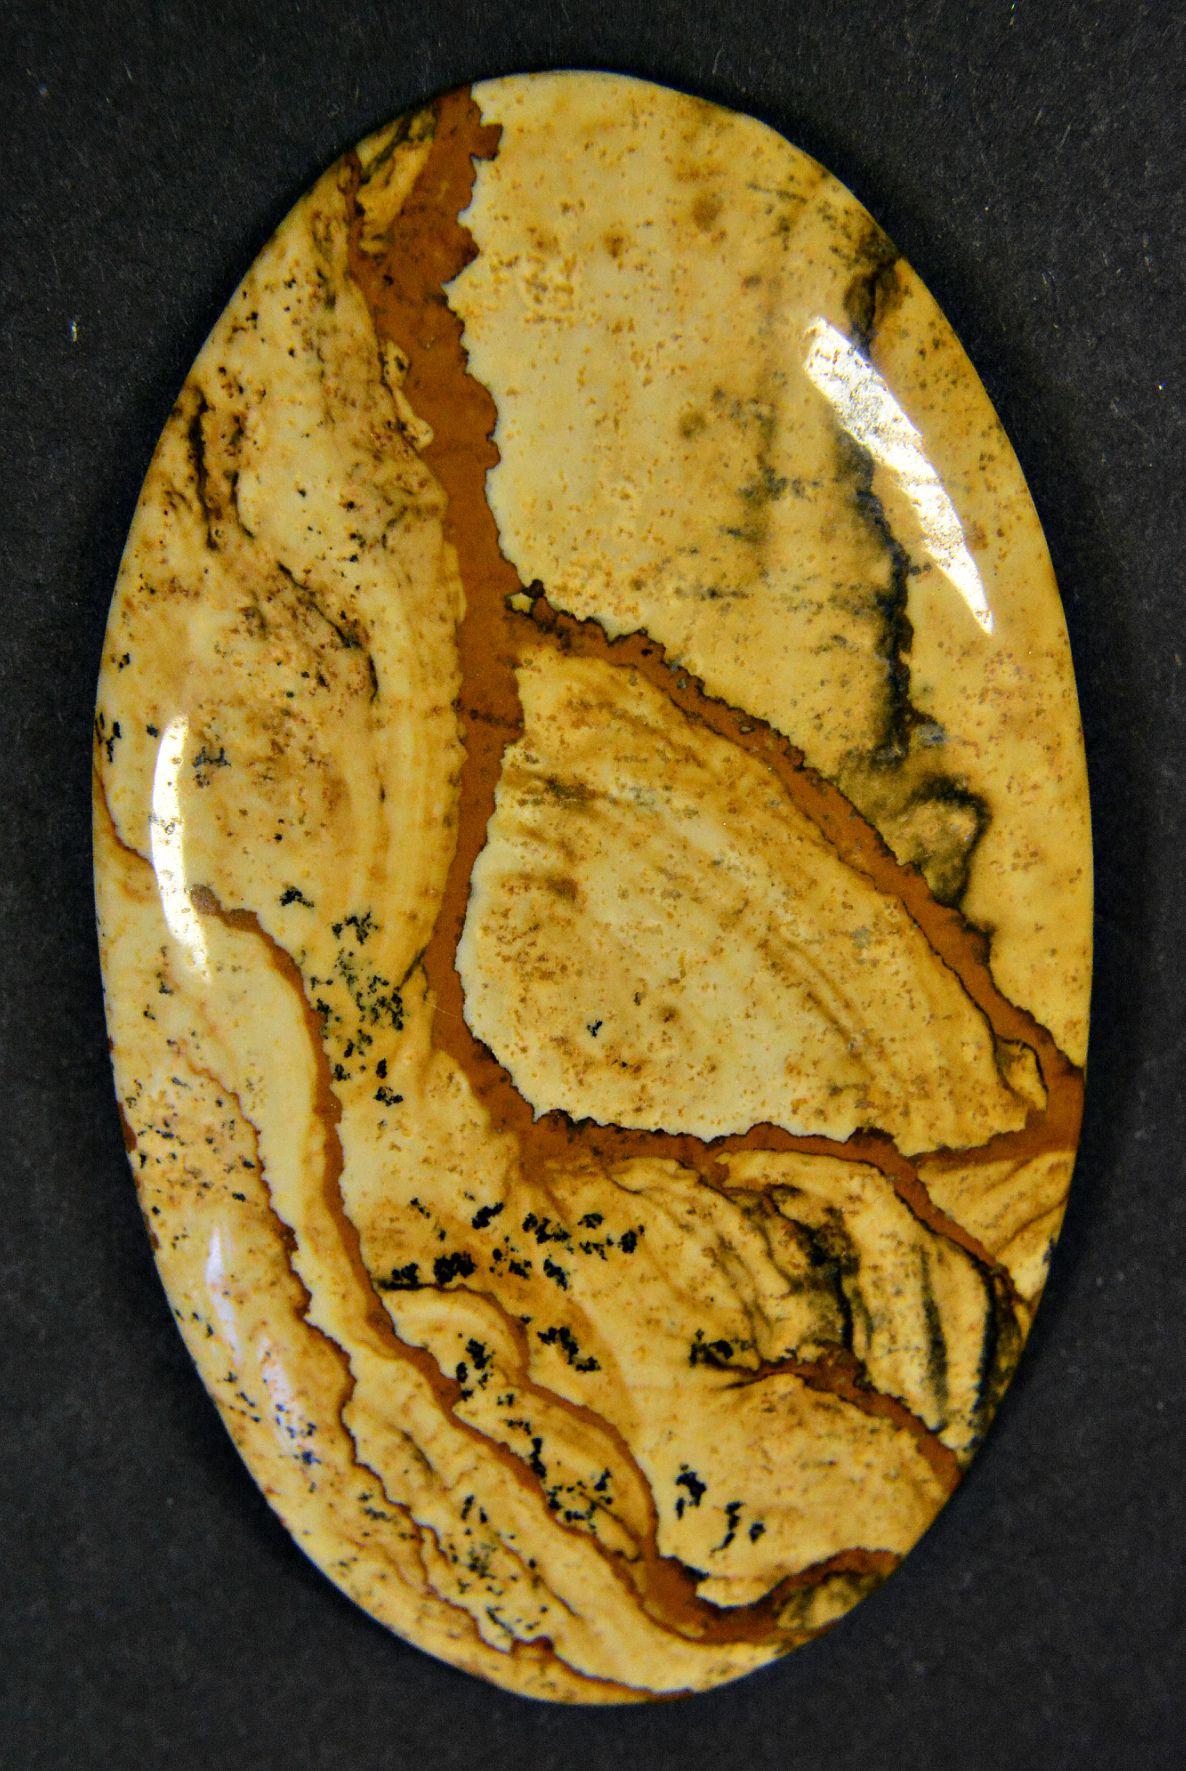 минералы оптом натура яшма агат кварц природные камни натуральные кабошоны